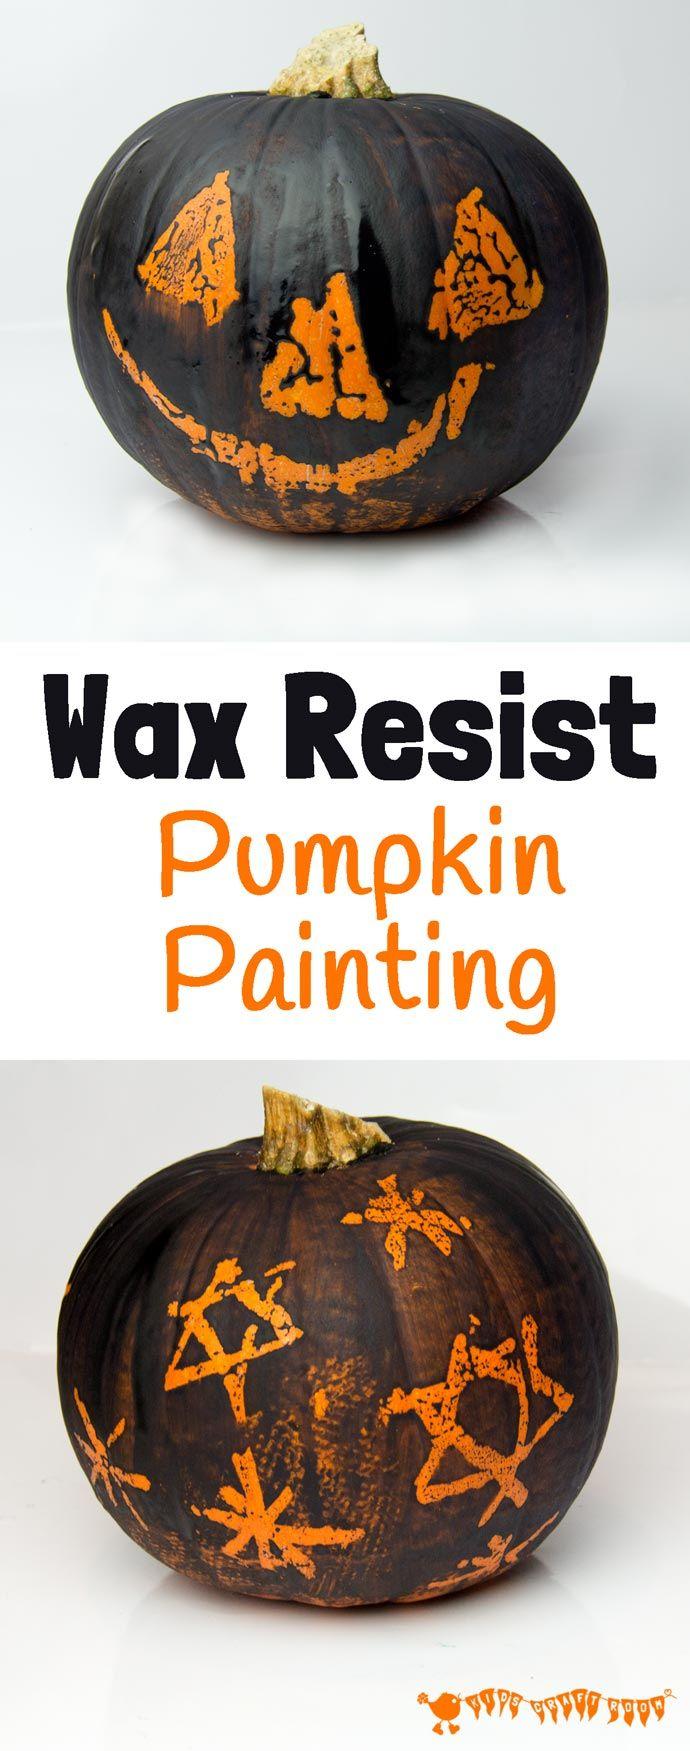 Wax resist pumpkin carving alternative crafts